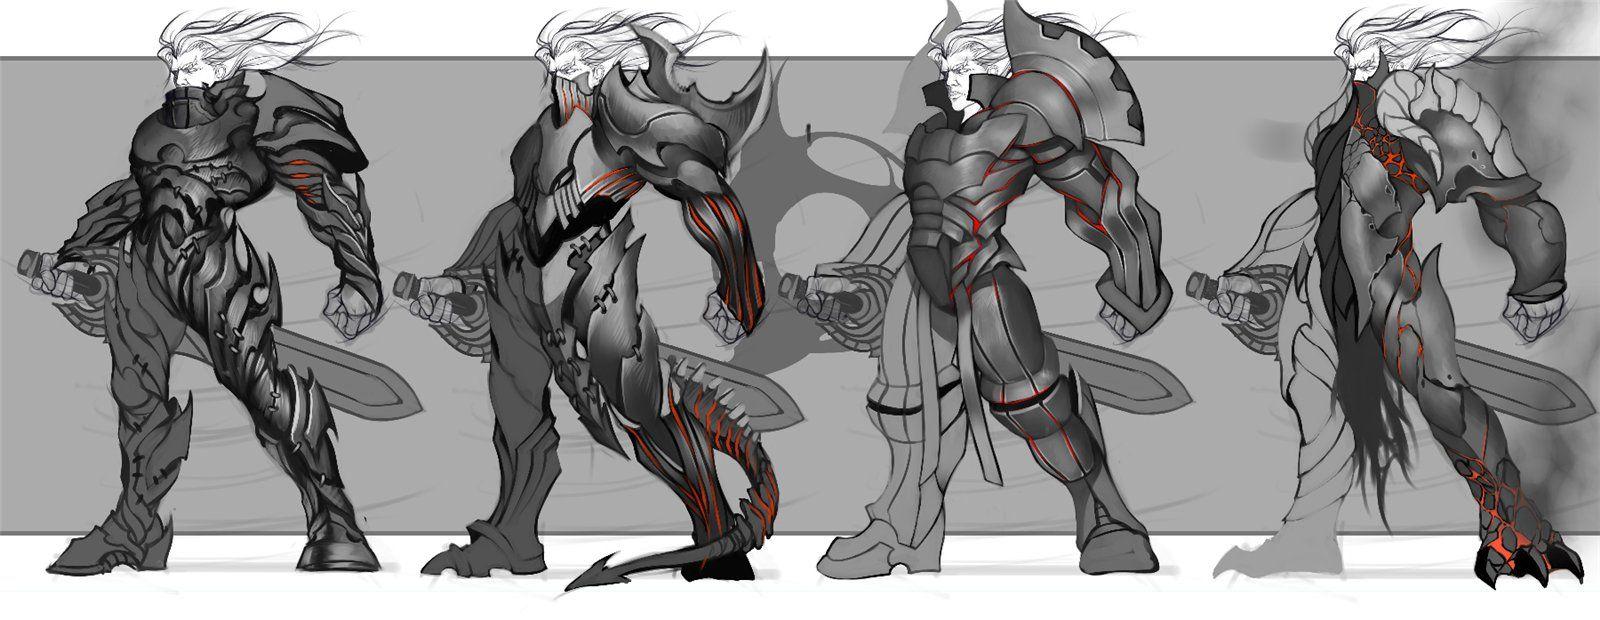 Game Character Design Tutorial : Resultado de imagem para concept art tutorial character